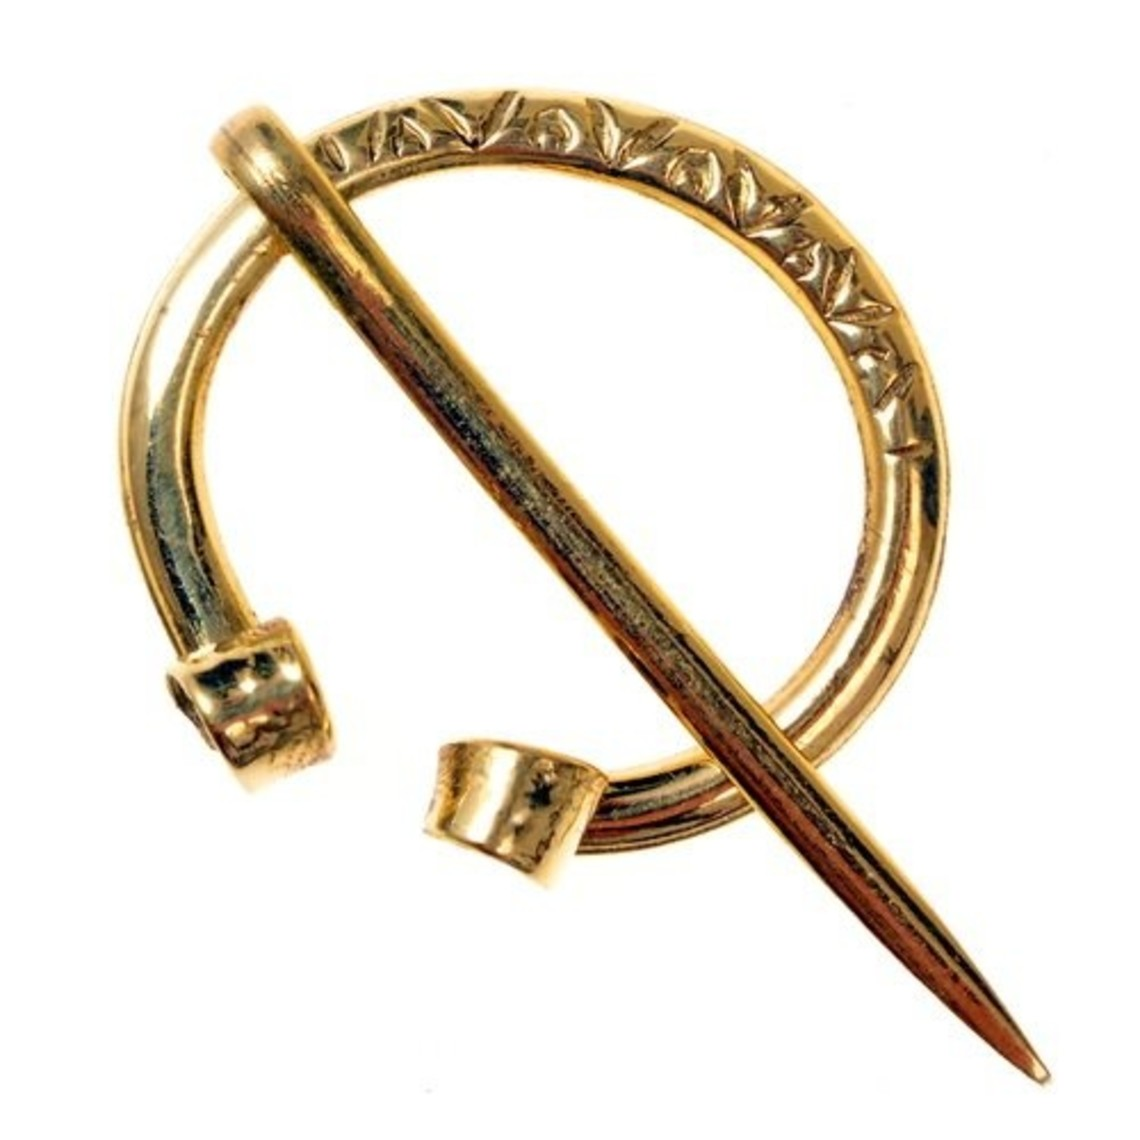 Vikingo herradura peroné Birka, bronce